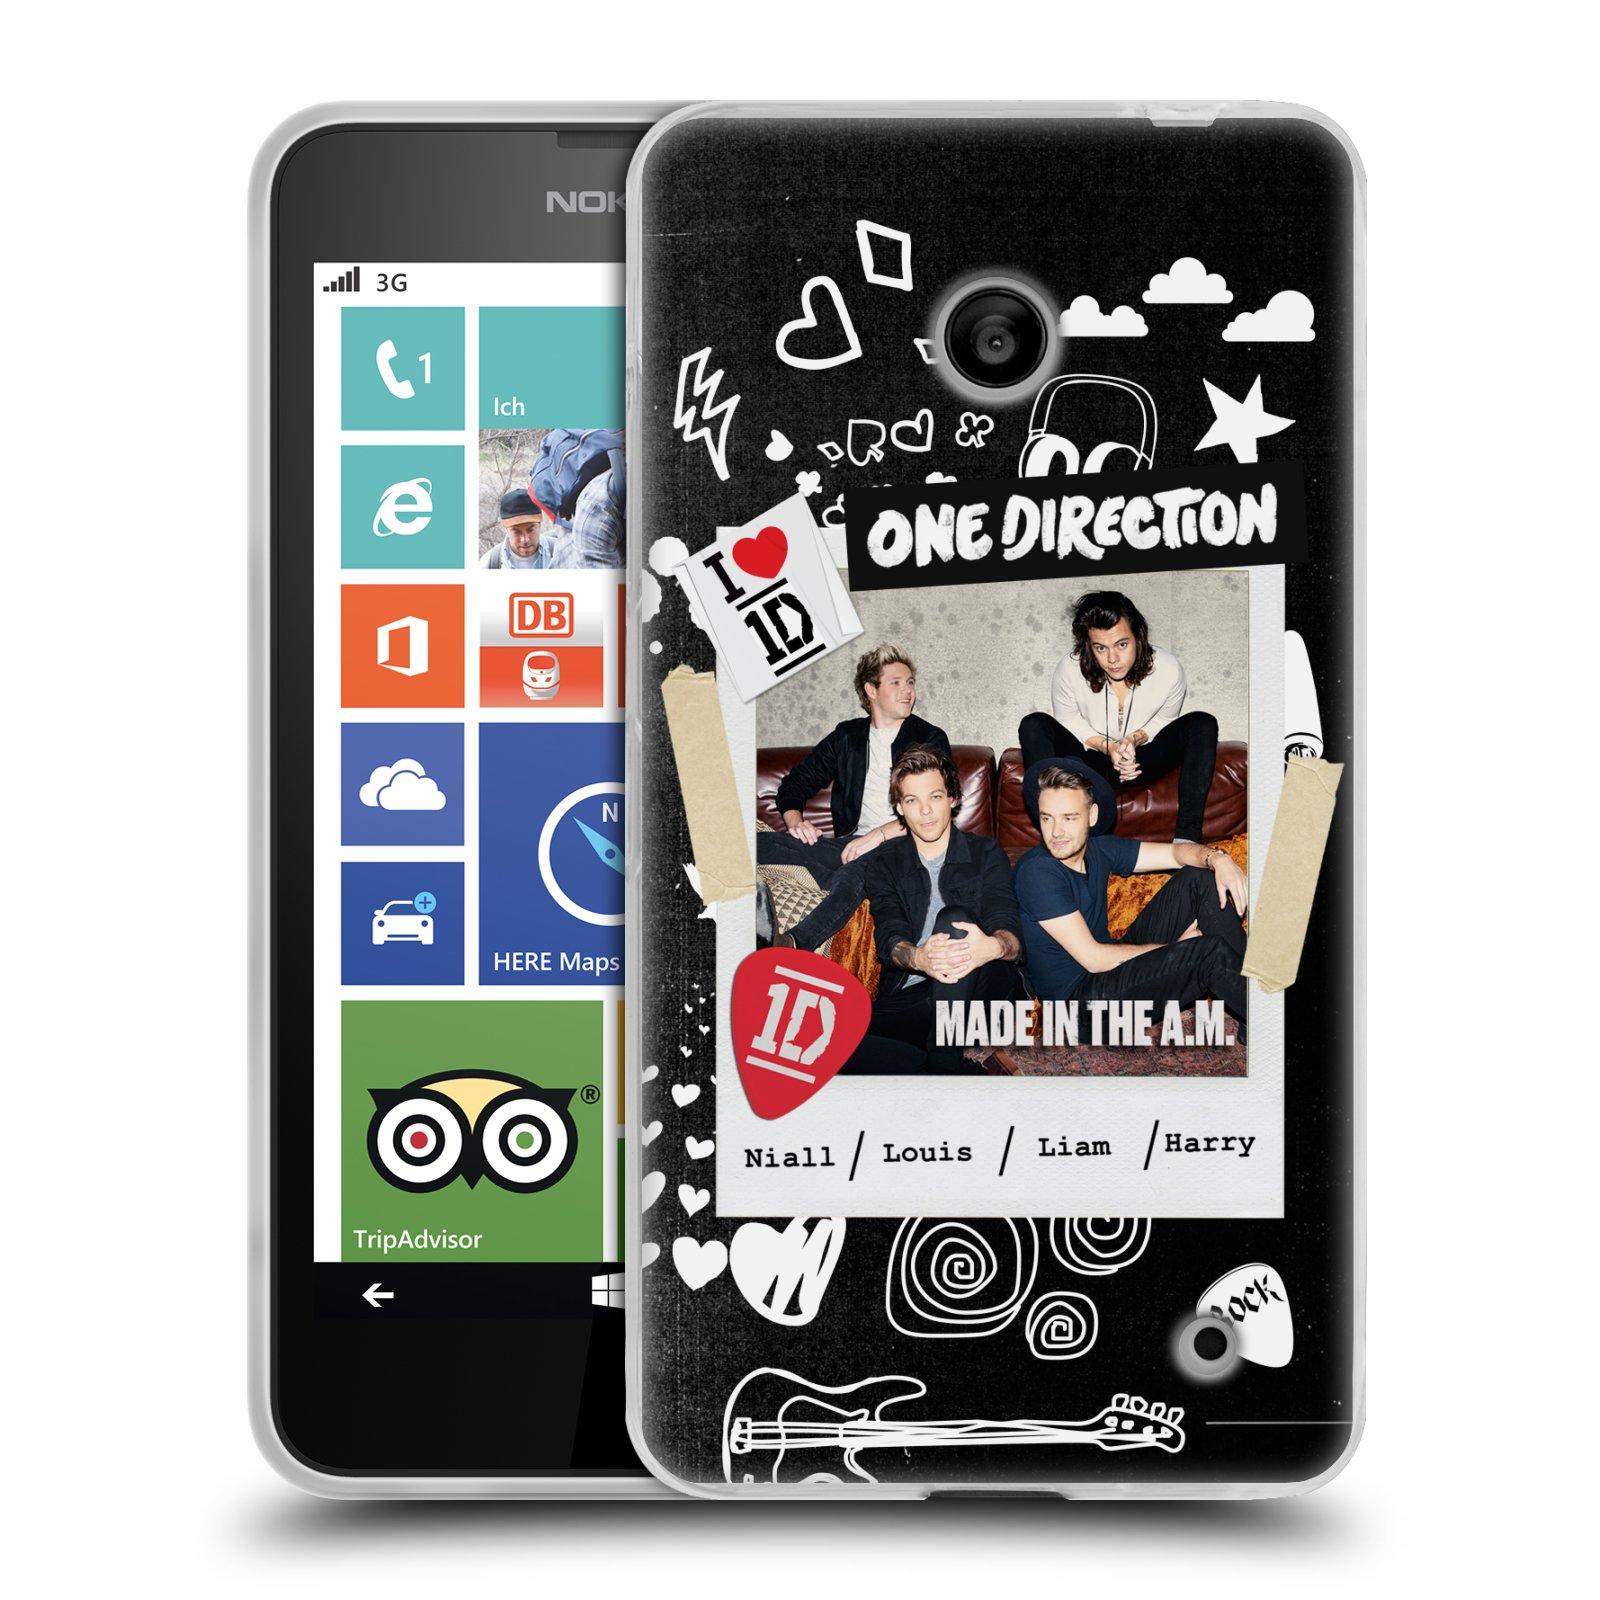 Silikonové pouzdro na mobil Nokia Lumia 635 HEAD CASE One Direction - S kytárou (Silikonový kryt či obal One Direction Official na mobilní telefon Nokia Lumia 635 Dual SIM)